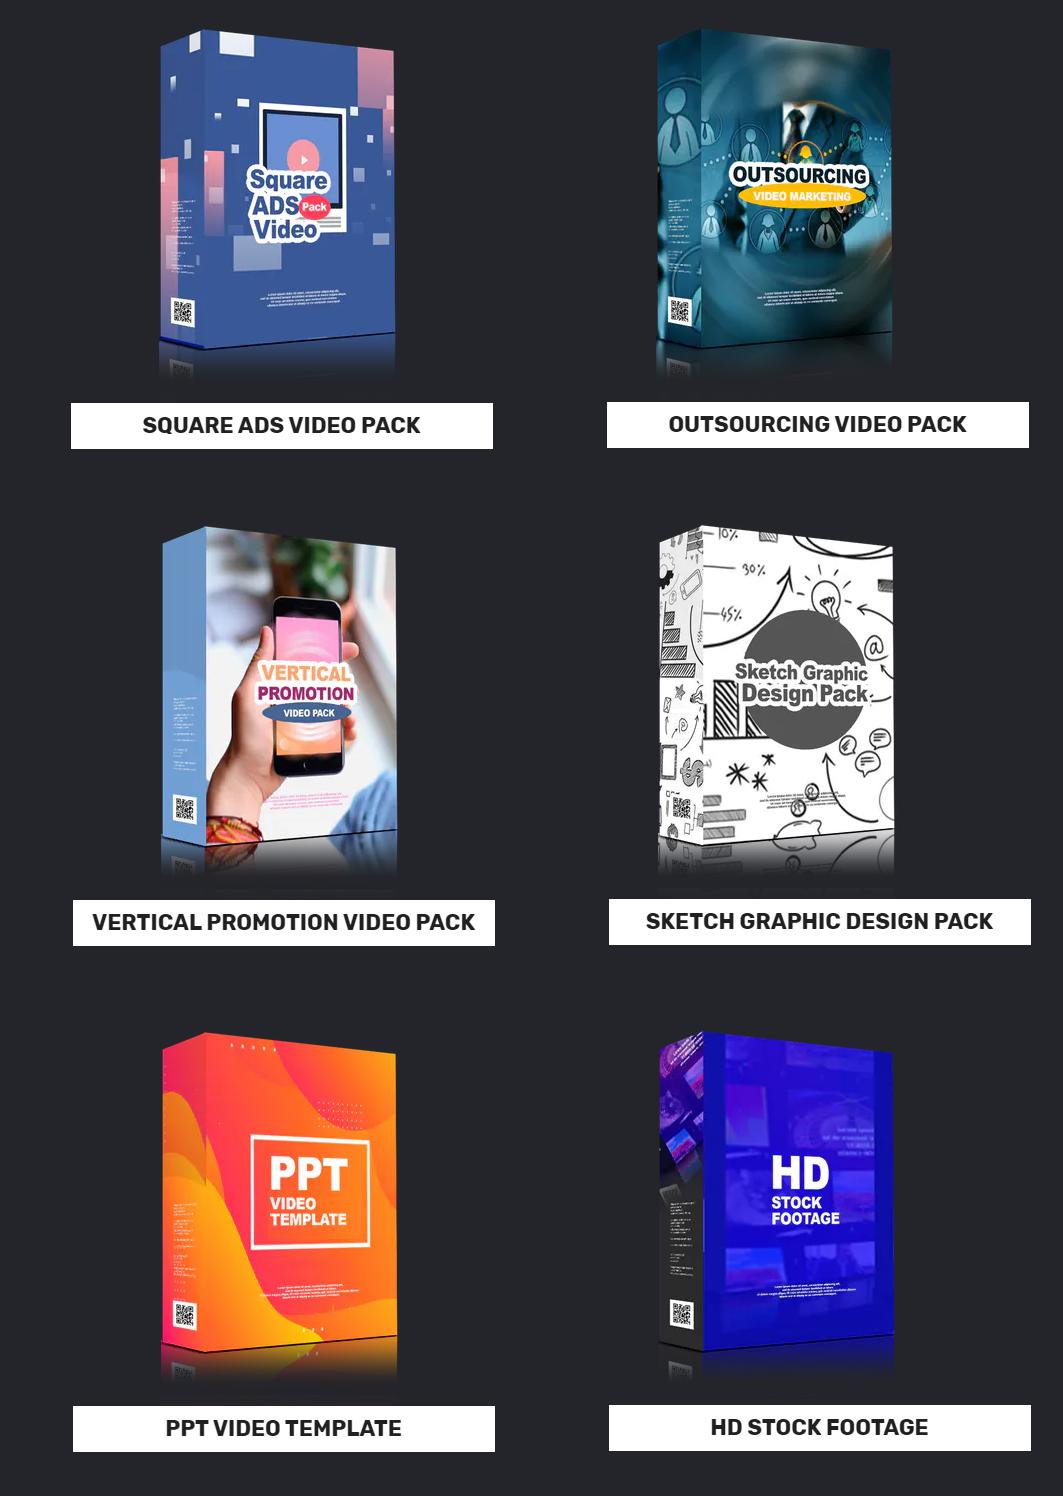 Envidio-2-0-YouTuber-Things-Bonus-2